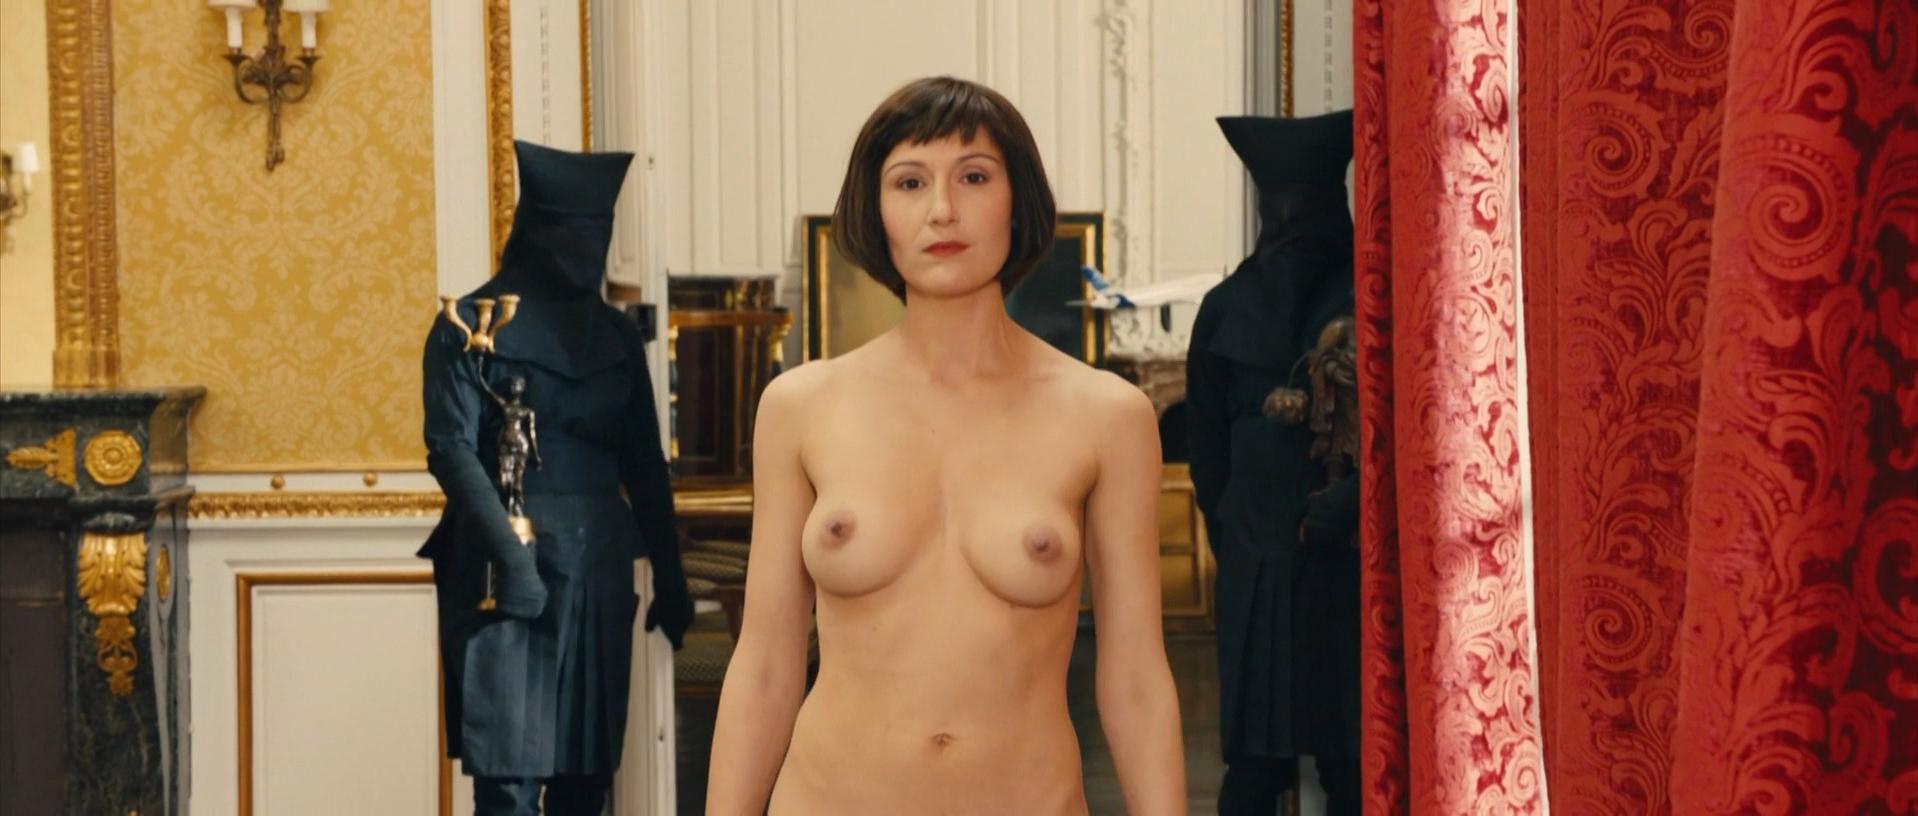 nude-minister-nudist-family-life